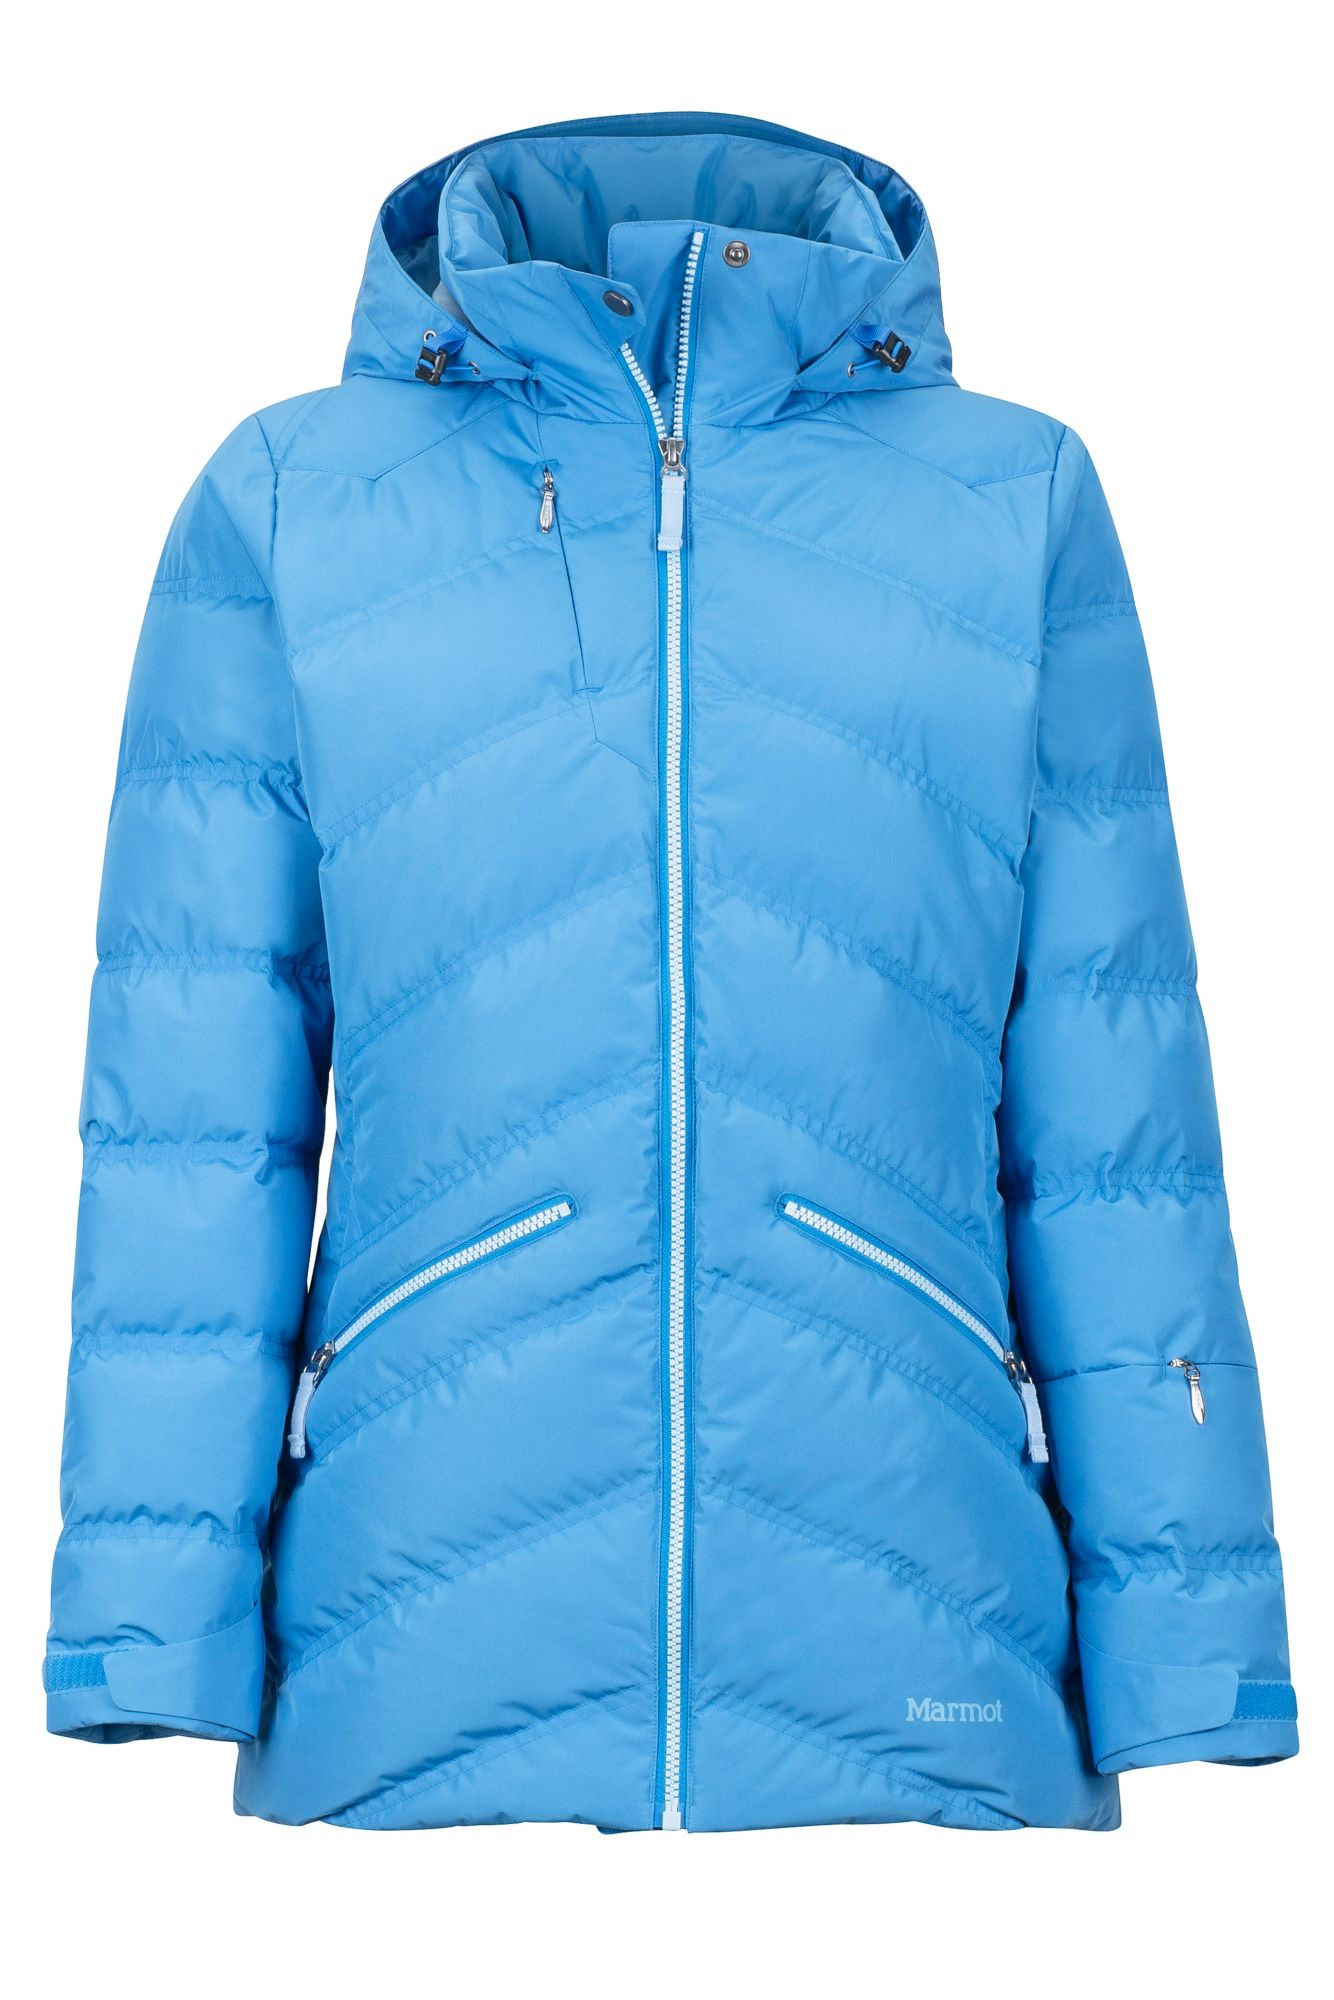 Wm S Val D Sere Jacket